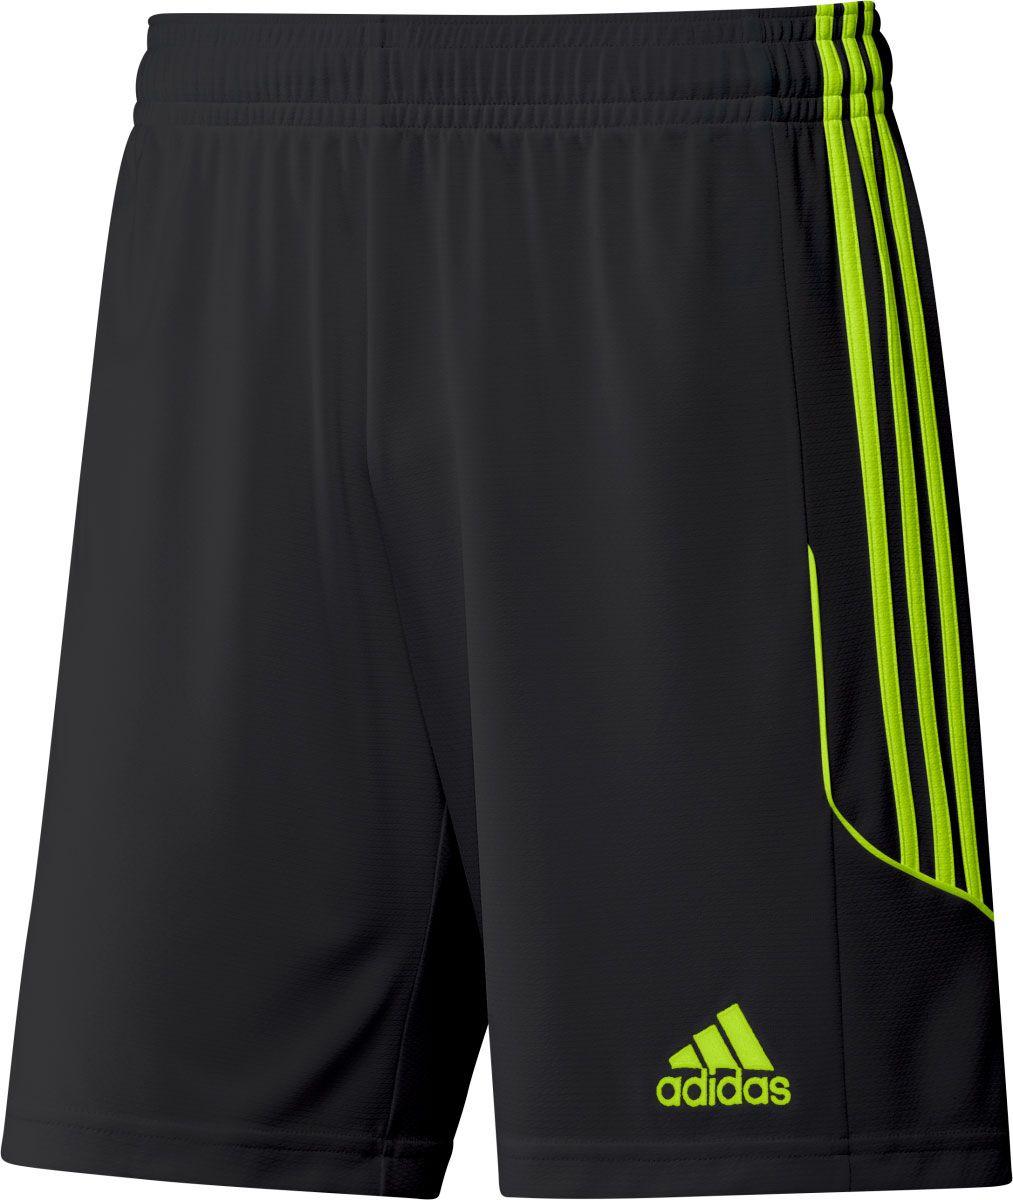 Adidas Uomini Uomini Adidas Calcio Short Dick I'sportivo 428135